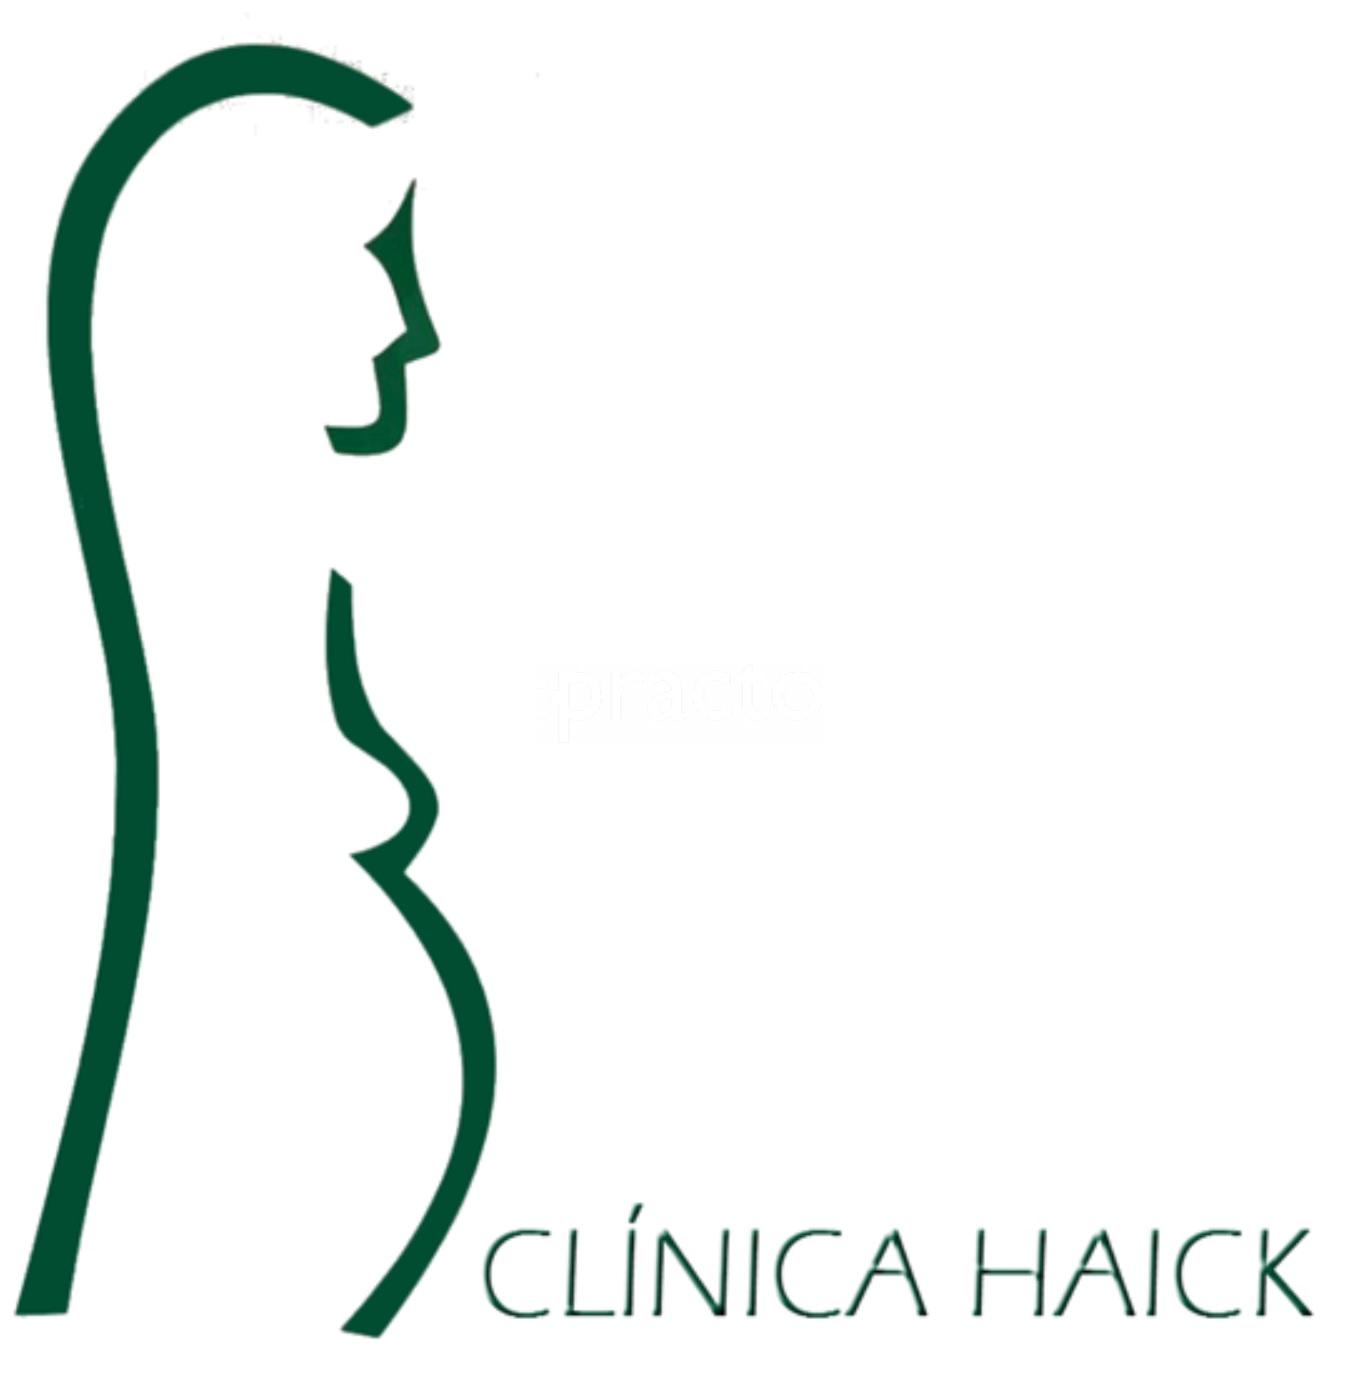 Clínica Haick